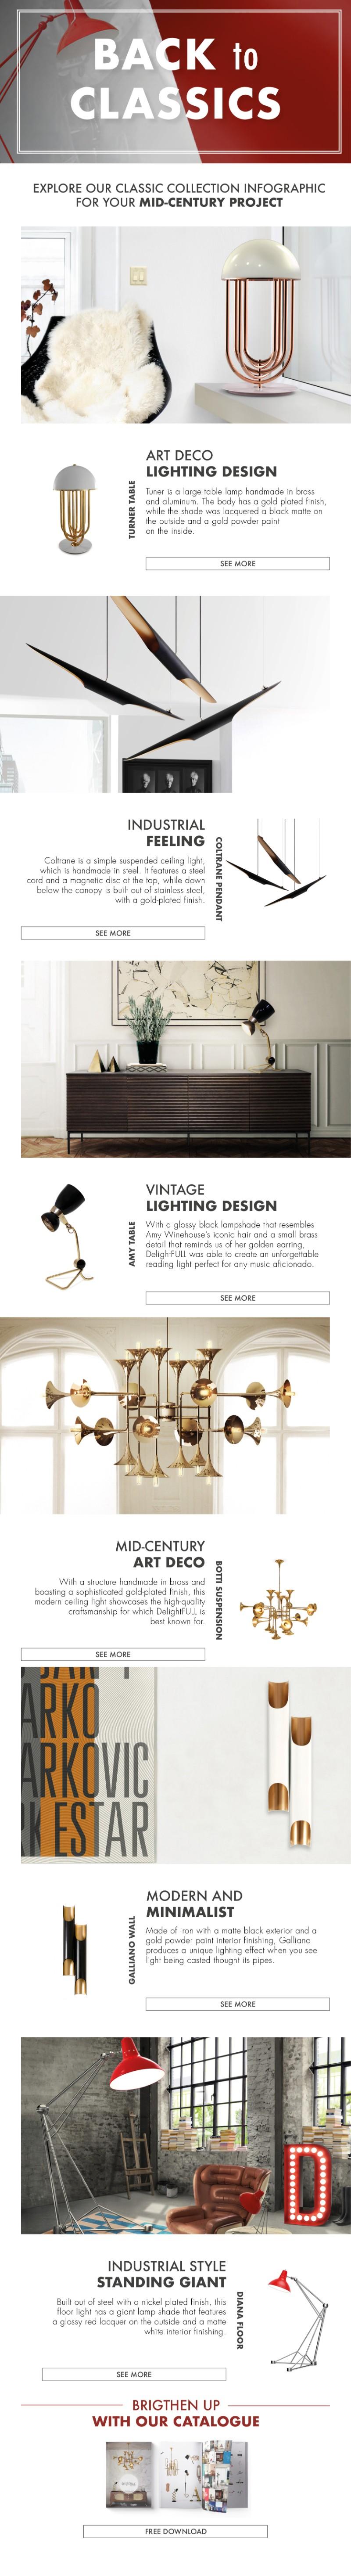 Back To Classics Feel The Best Lighting Design!